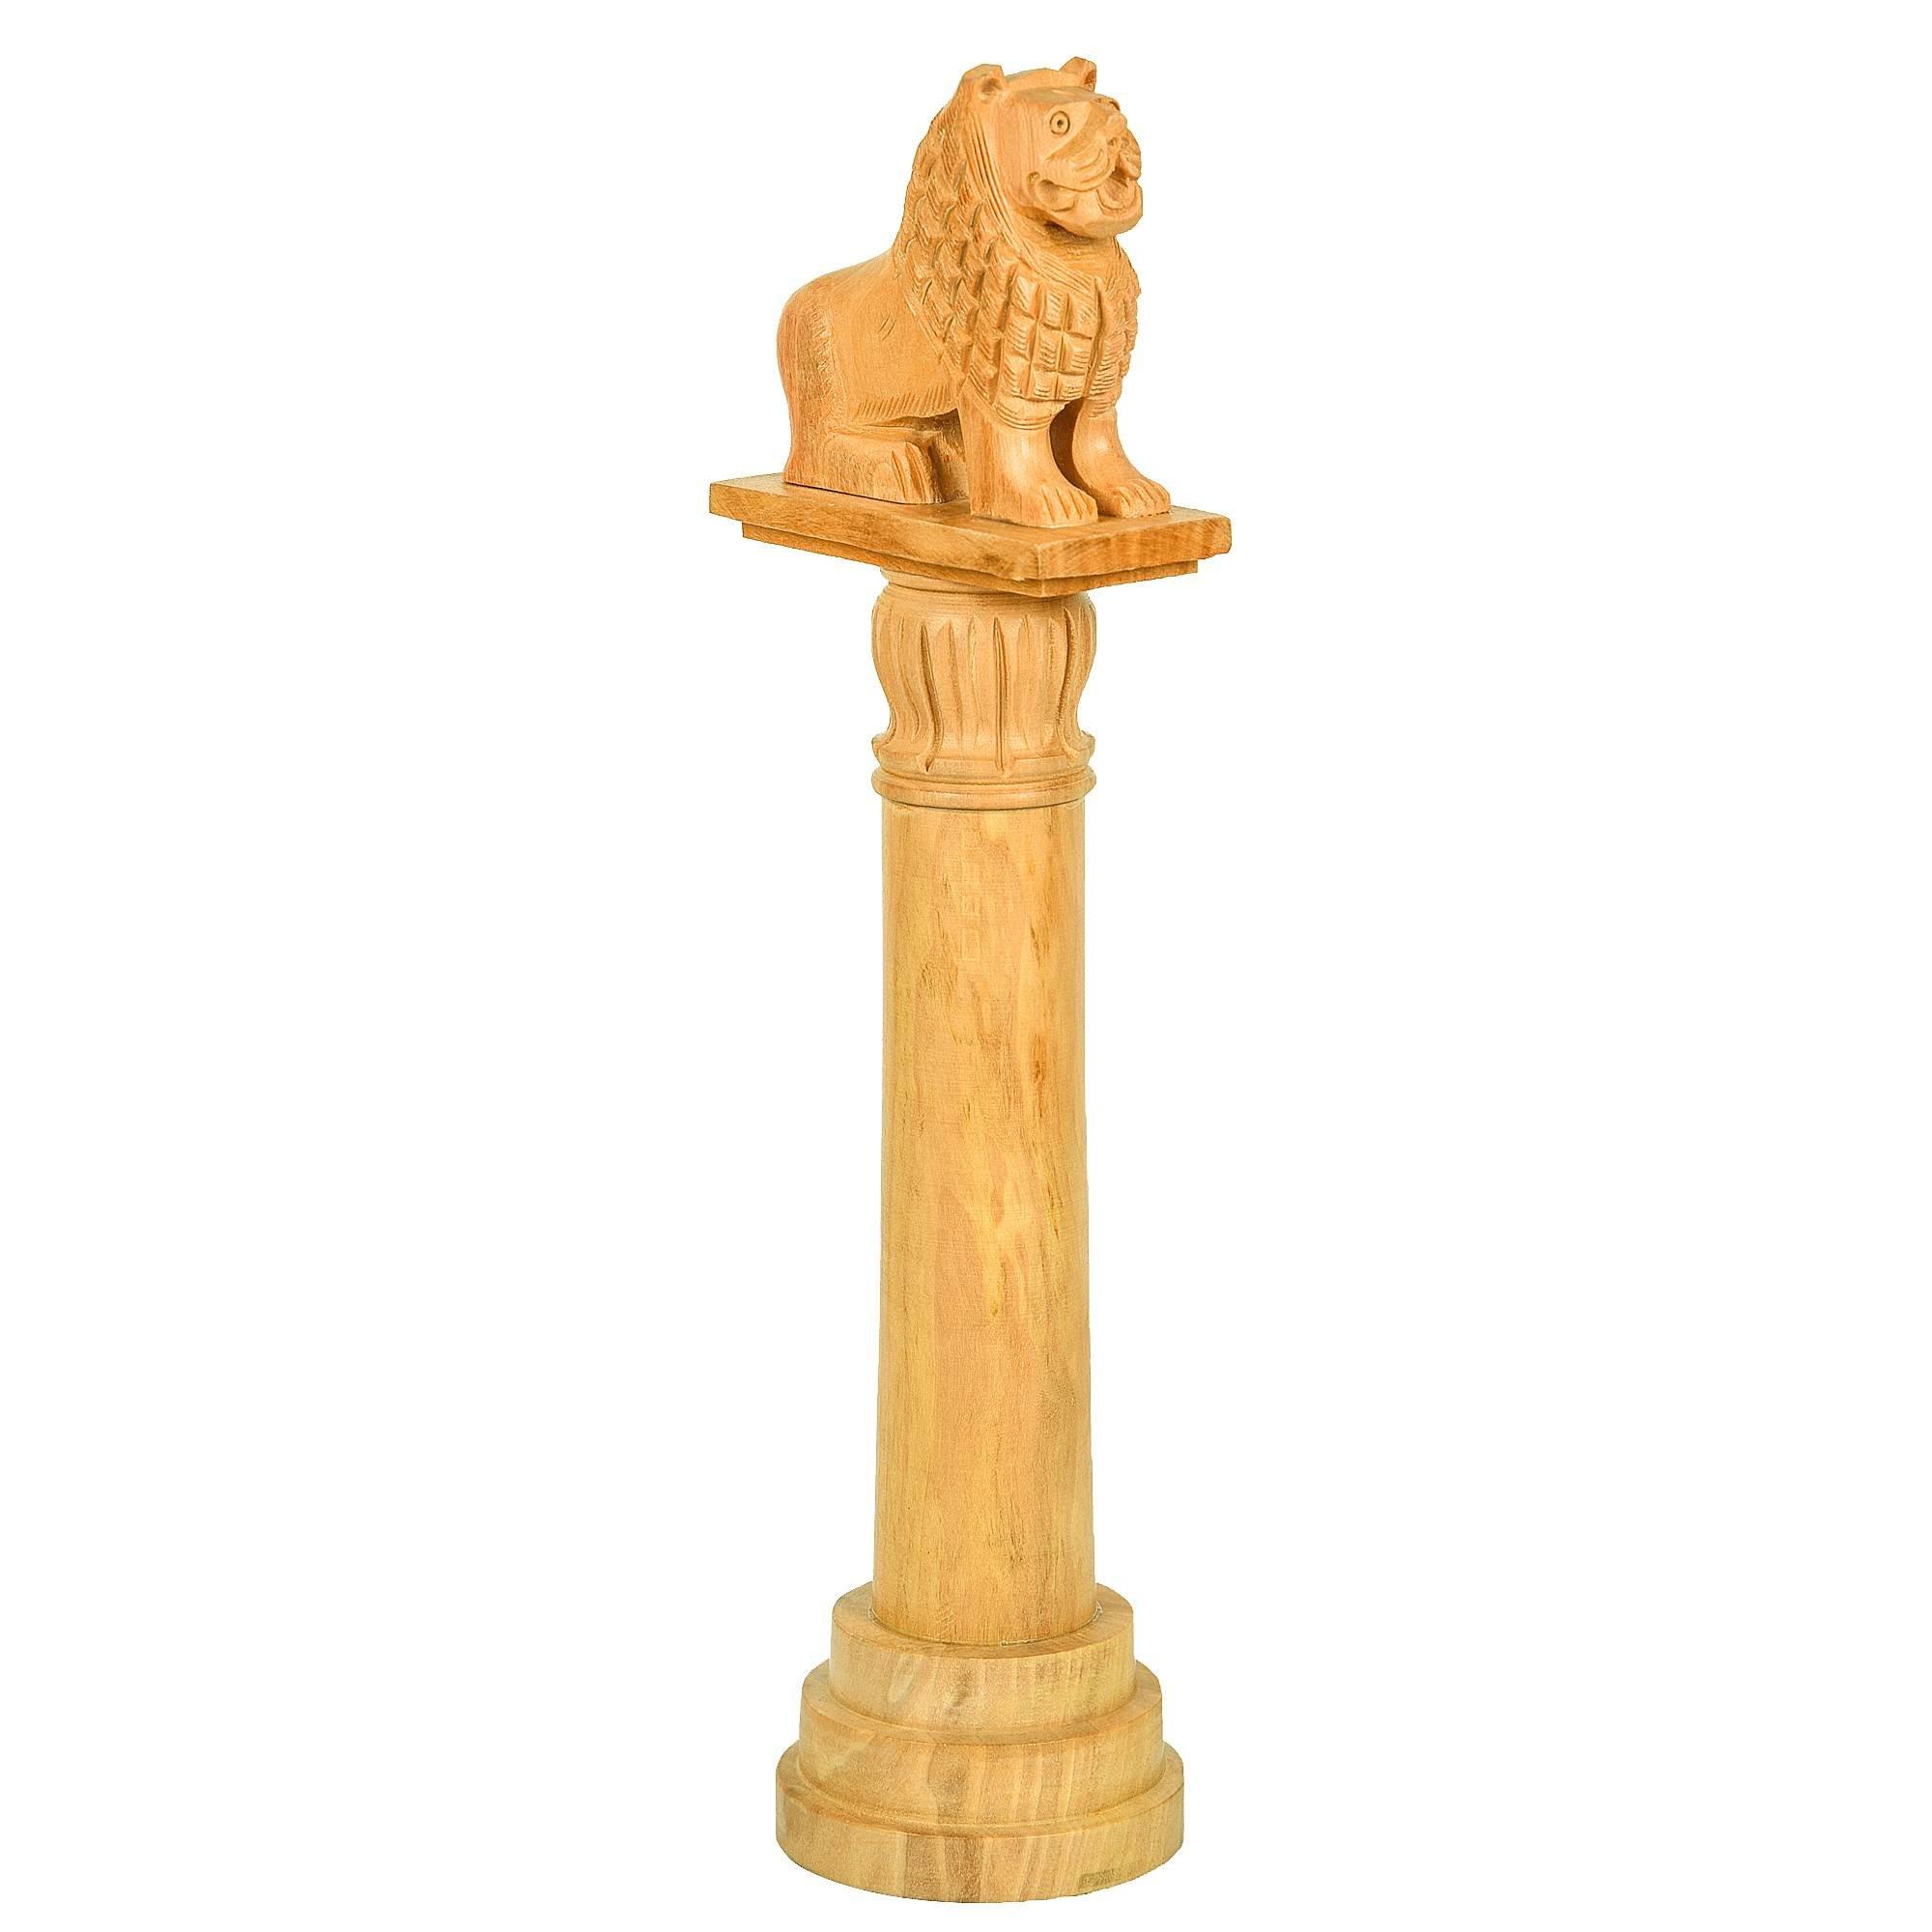 Fine Craft India Handicraft Wood Vaishali Lion Pillar Stambha Height: 12inch Color Light Brown